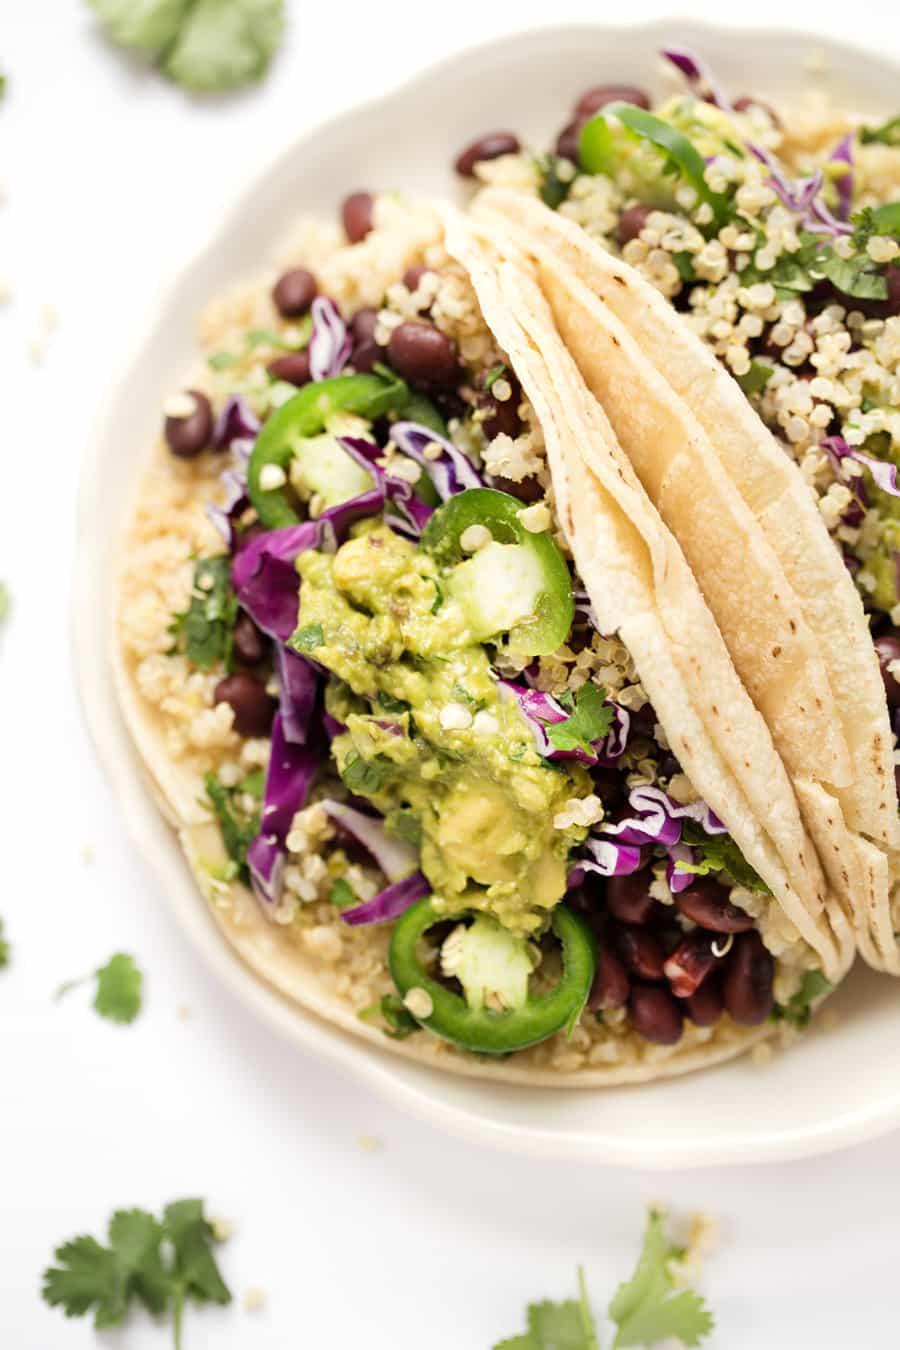 Cilantro Lime Black Bean Quinoa Tacos Simply Quinoa Recipe In 2020 Simply Quinoa Bean Recipes Mexican Food Recipes